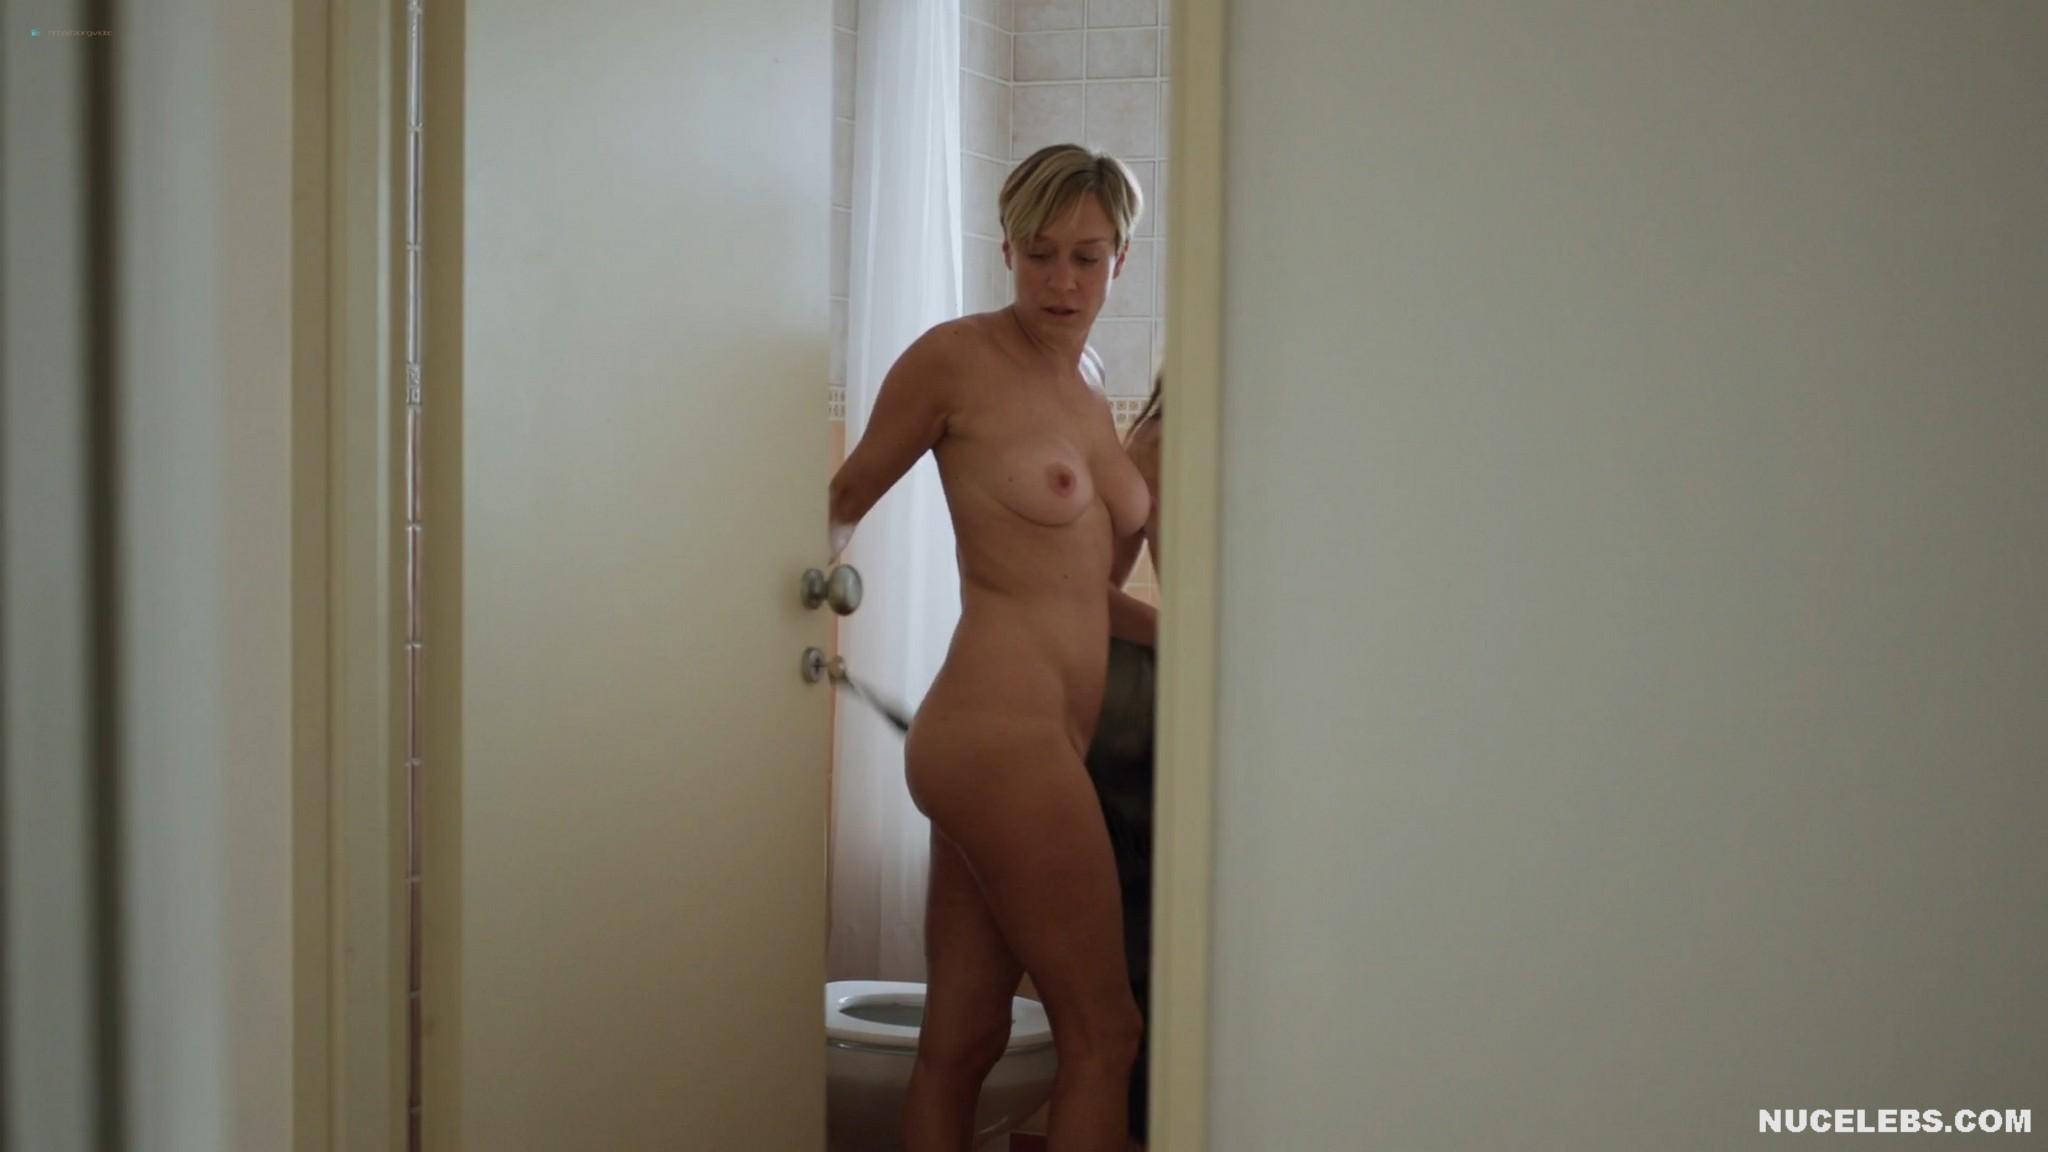 Nackt Chloë Sevigny  Chloe Sevigny